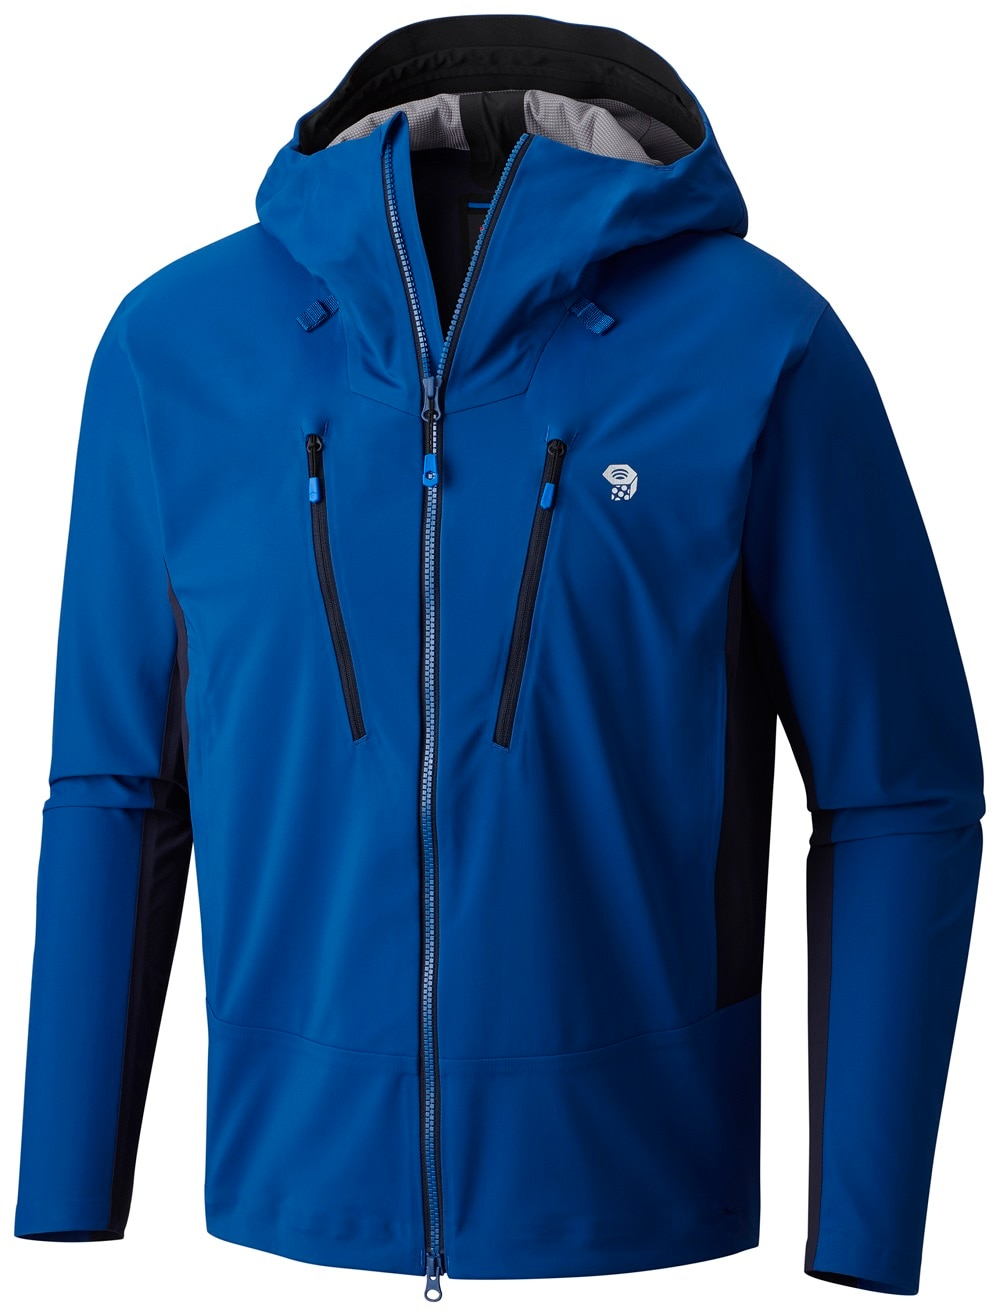 Mountain Hardwear Touren Hooded Jacket M's